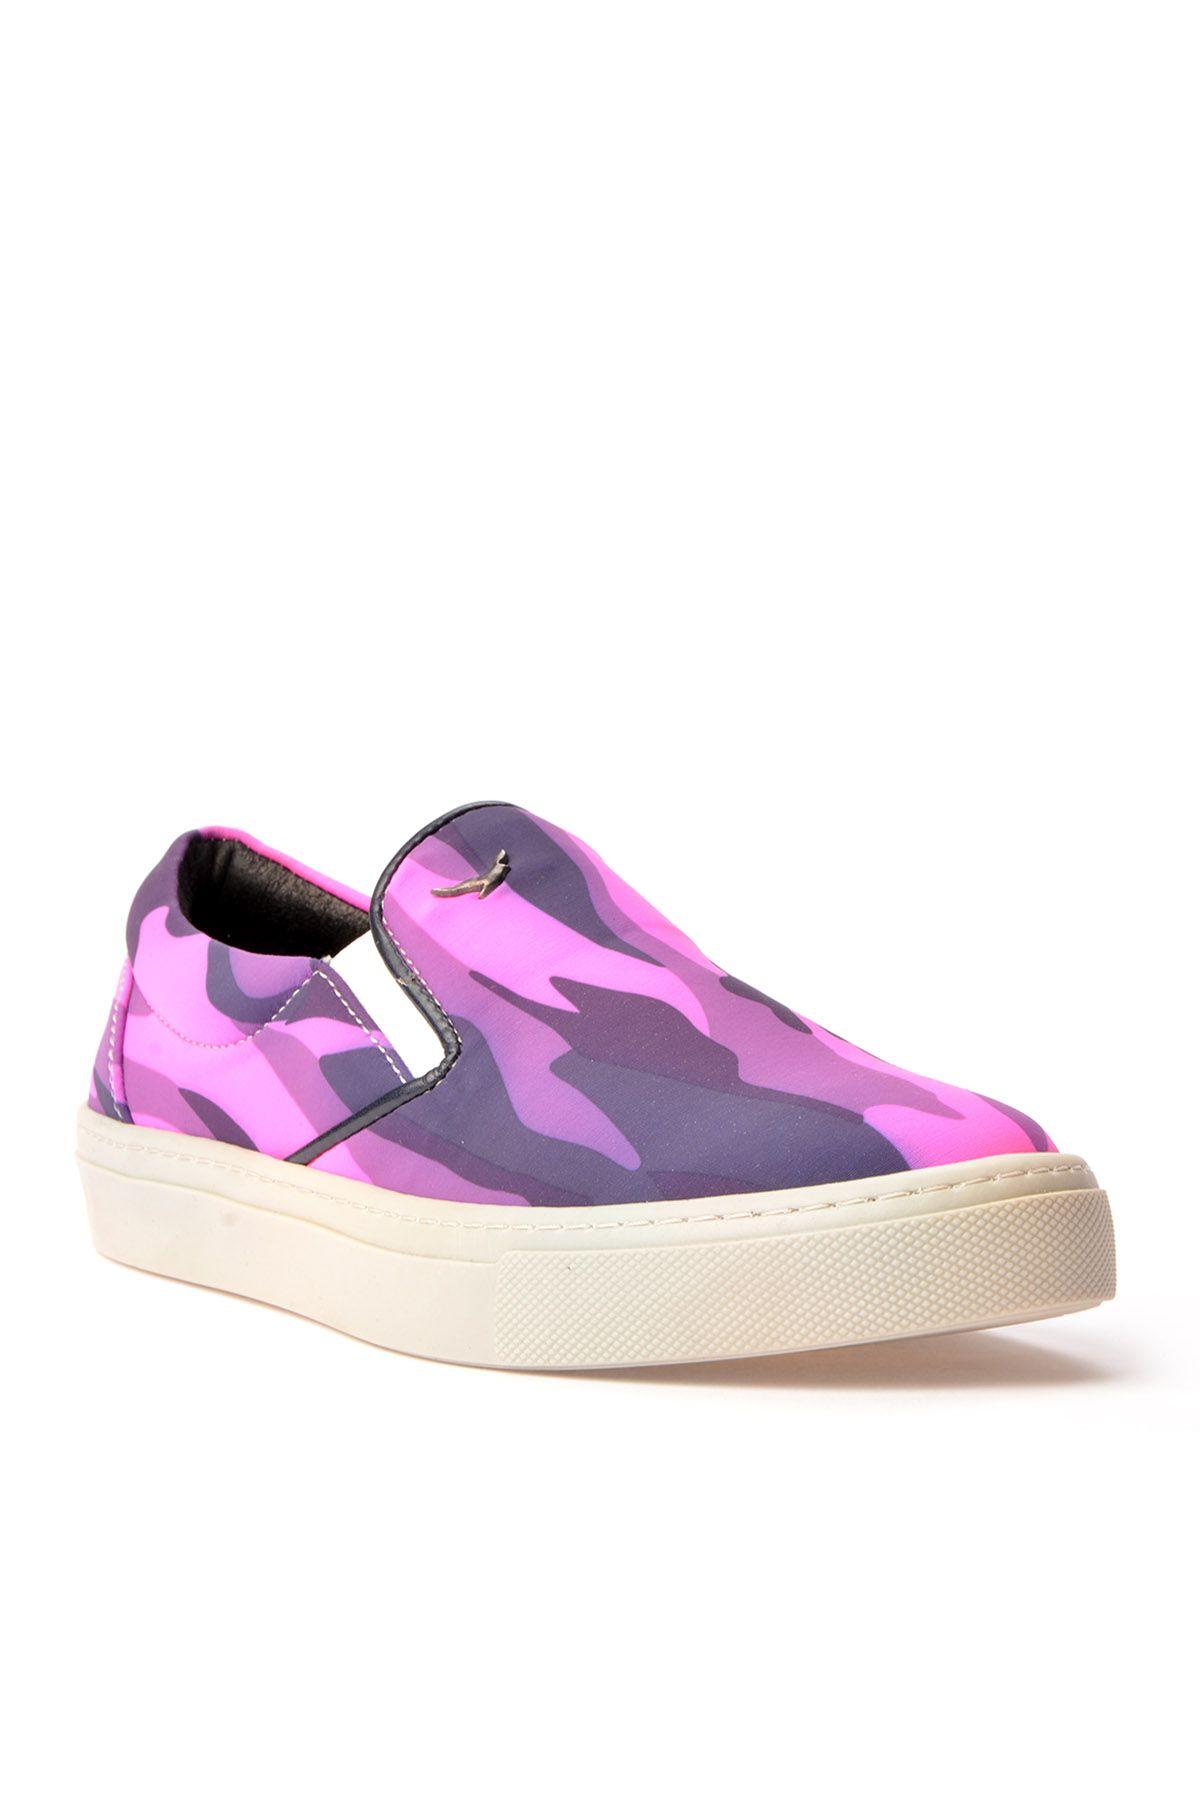 Art Goya Women Sneakers With Camouflage Pattern Pink